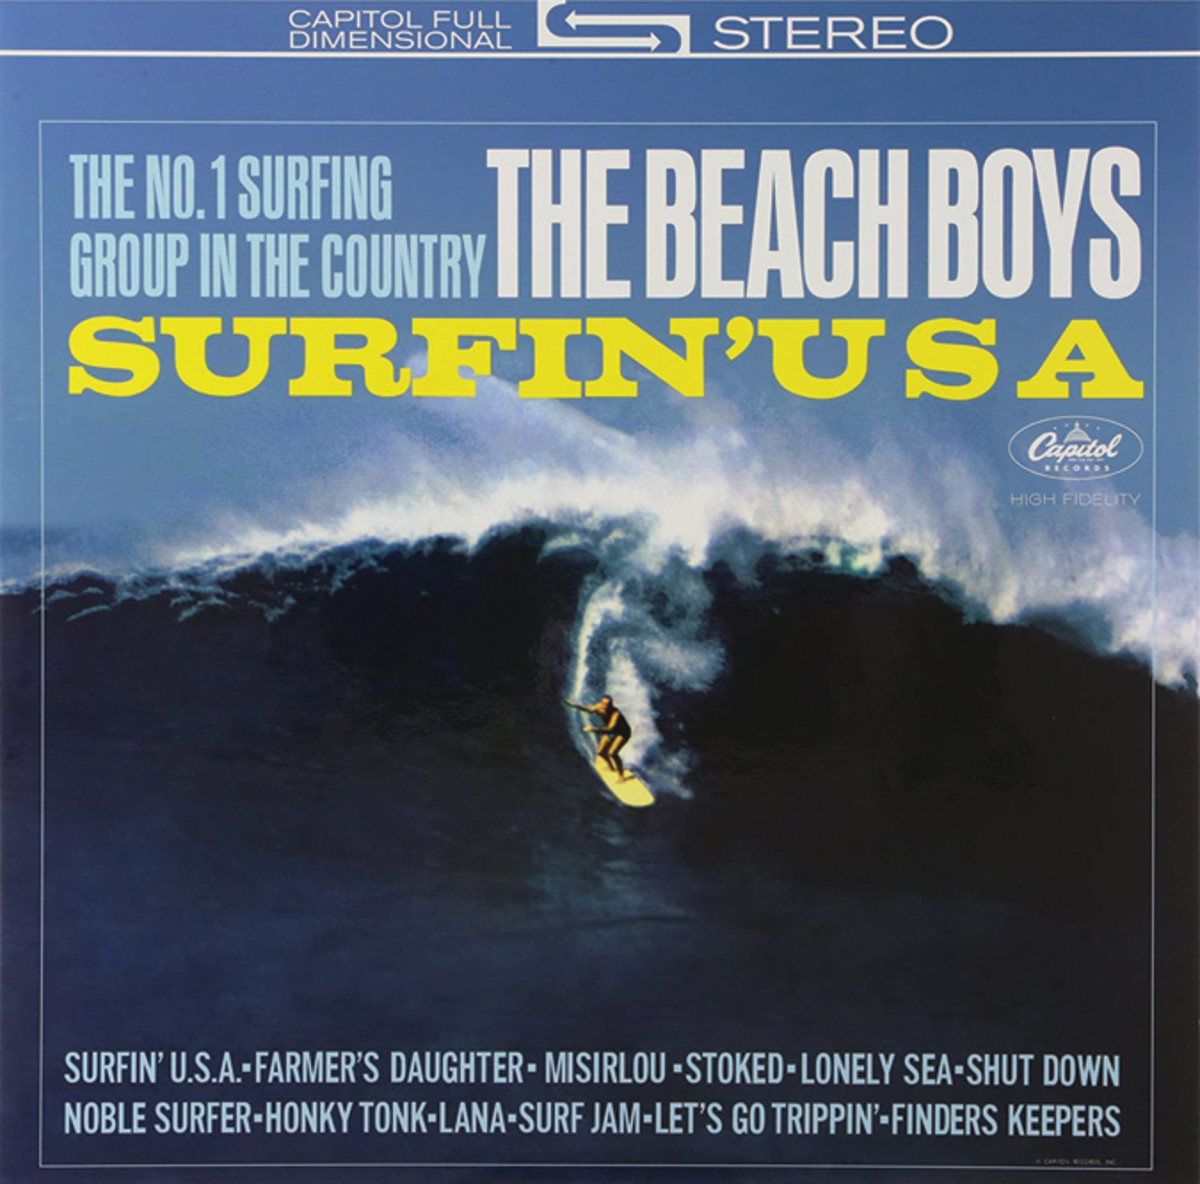 Beach Boys Surfin' U.S.A.